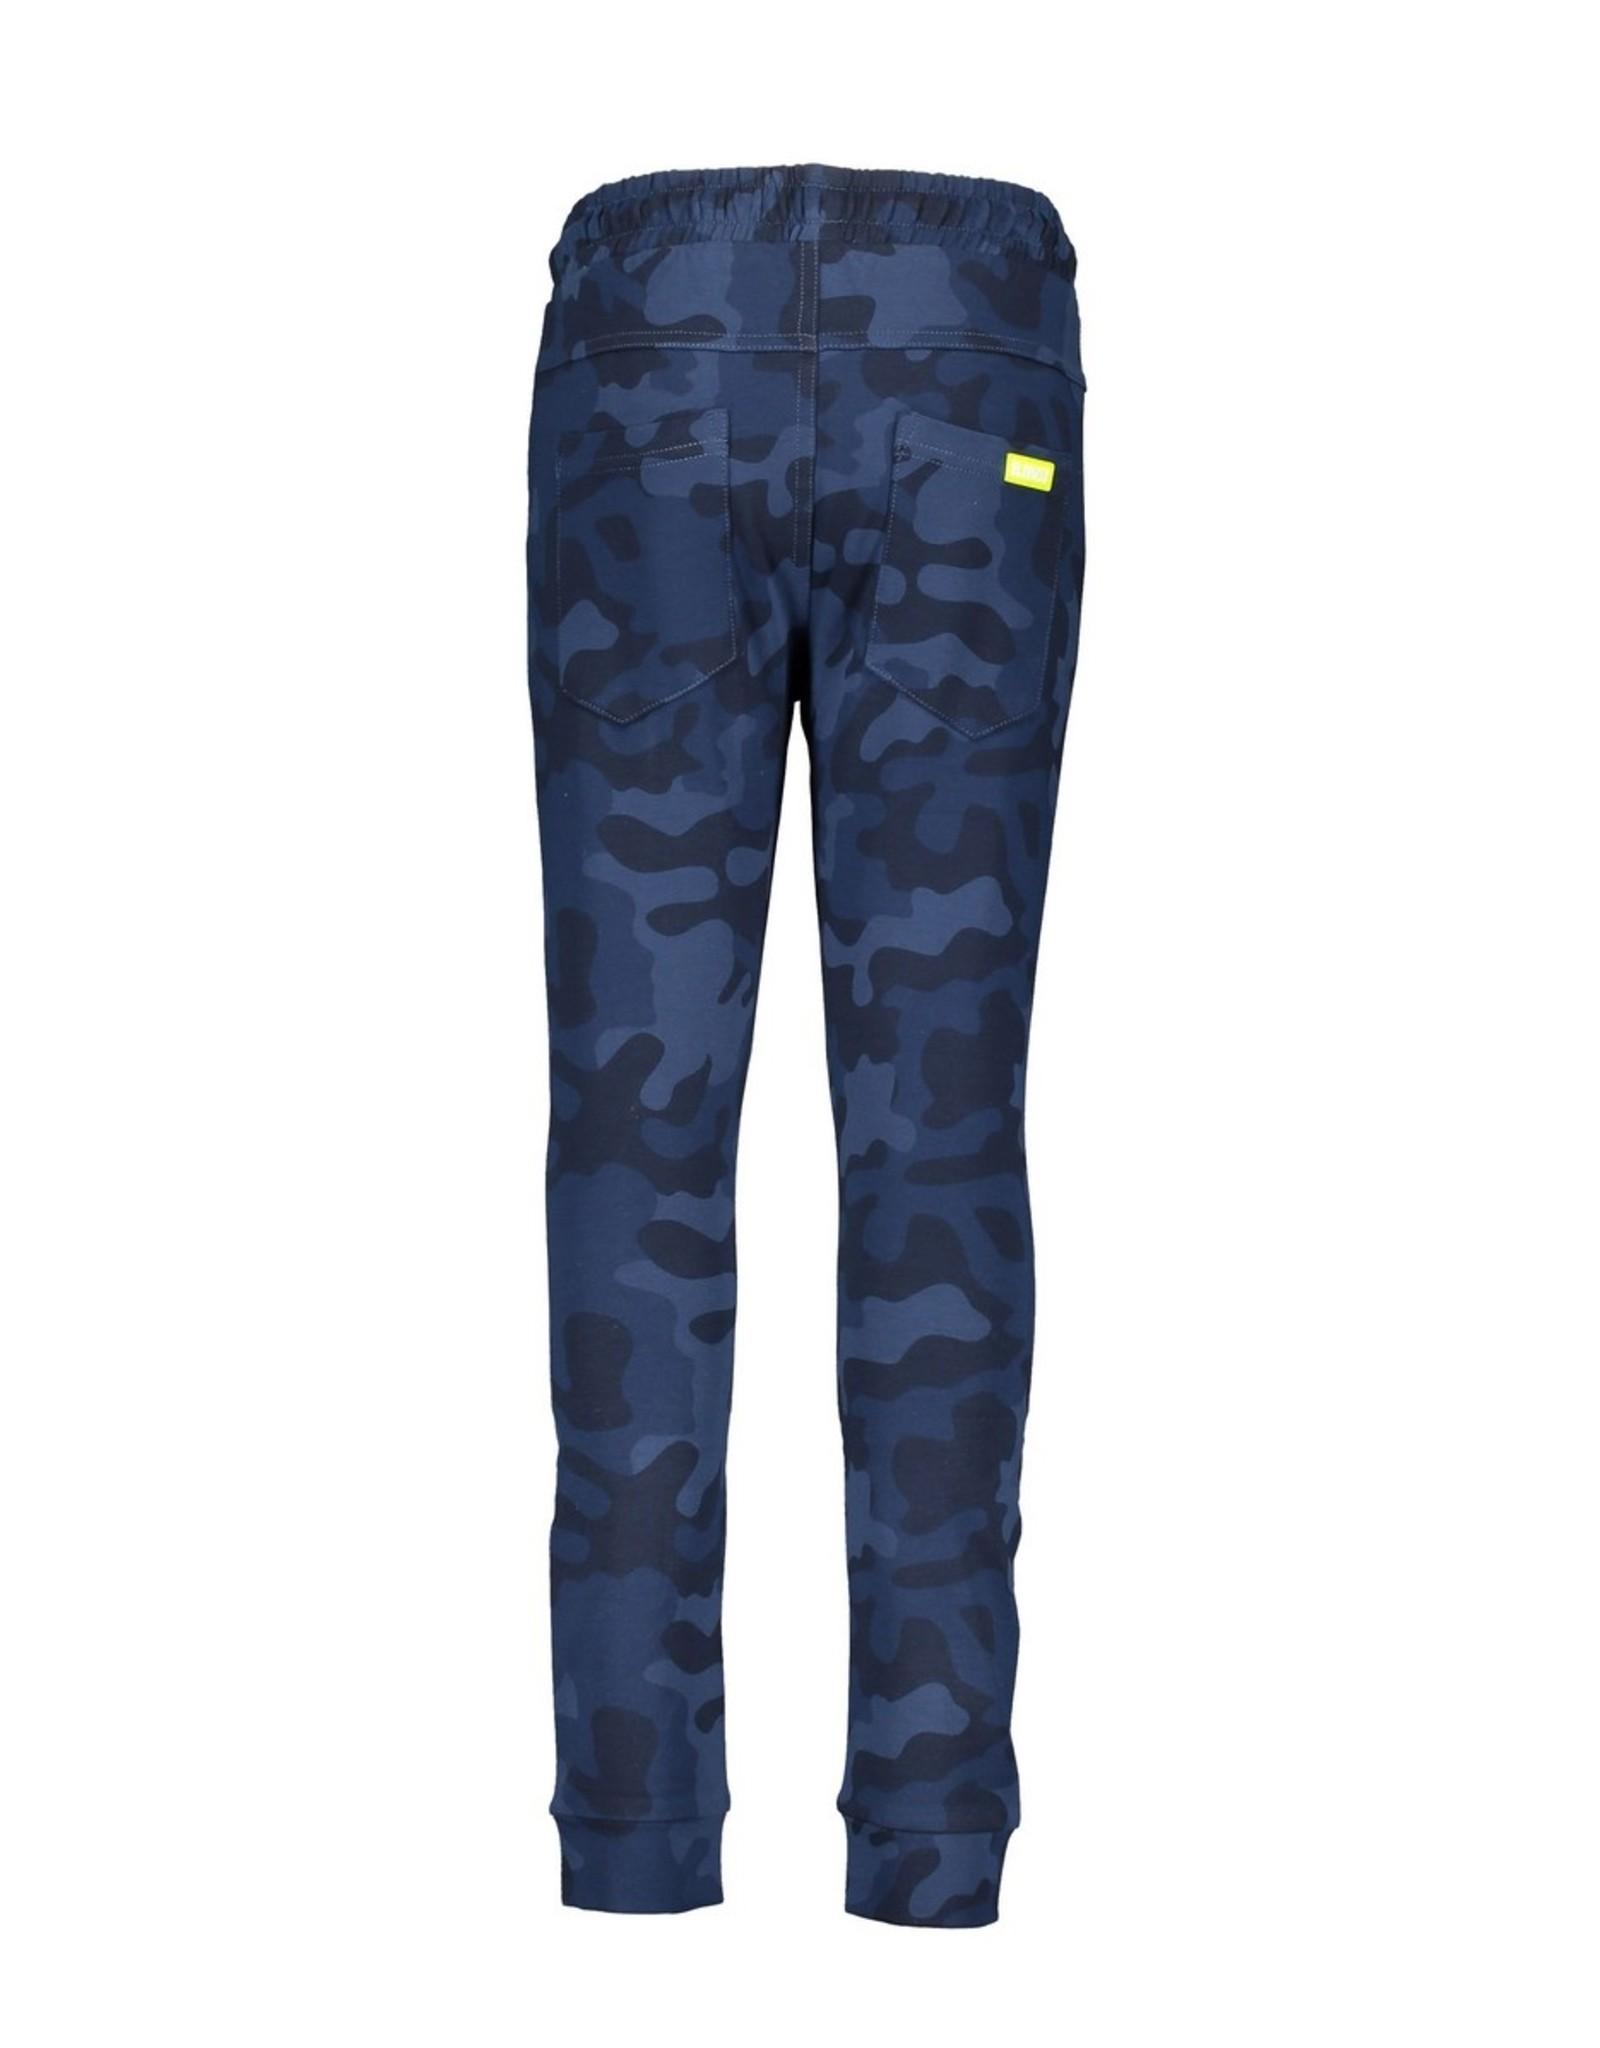 B.Nosy B.Nosy Boys all over print Camo Sweat Pants Space Blue